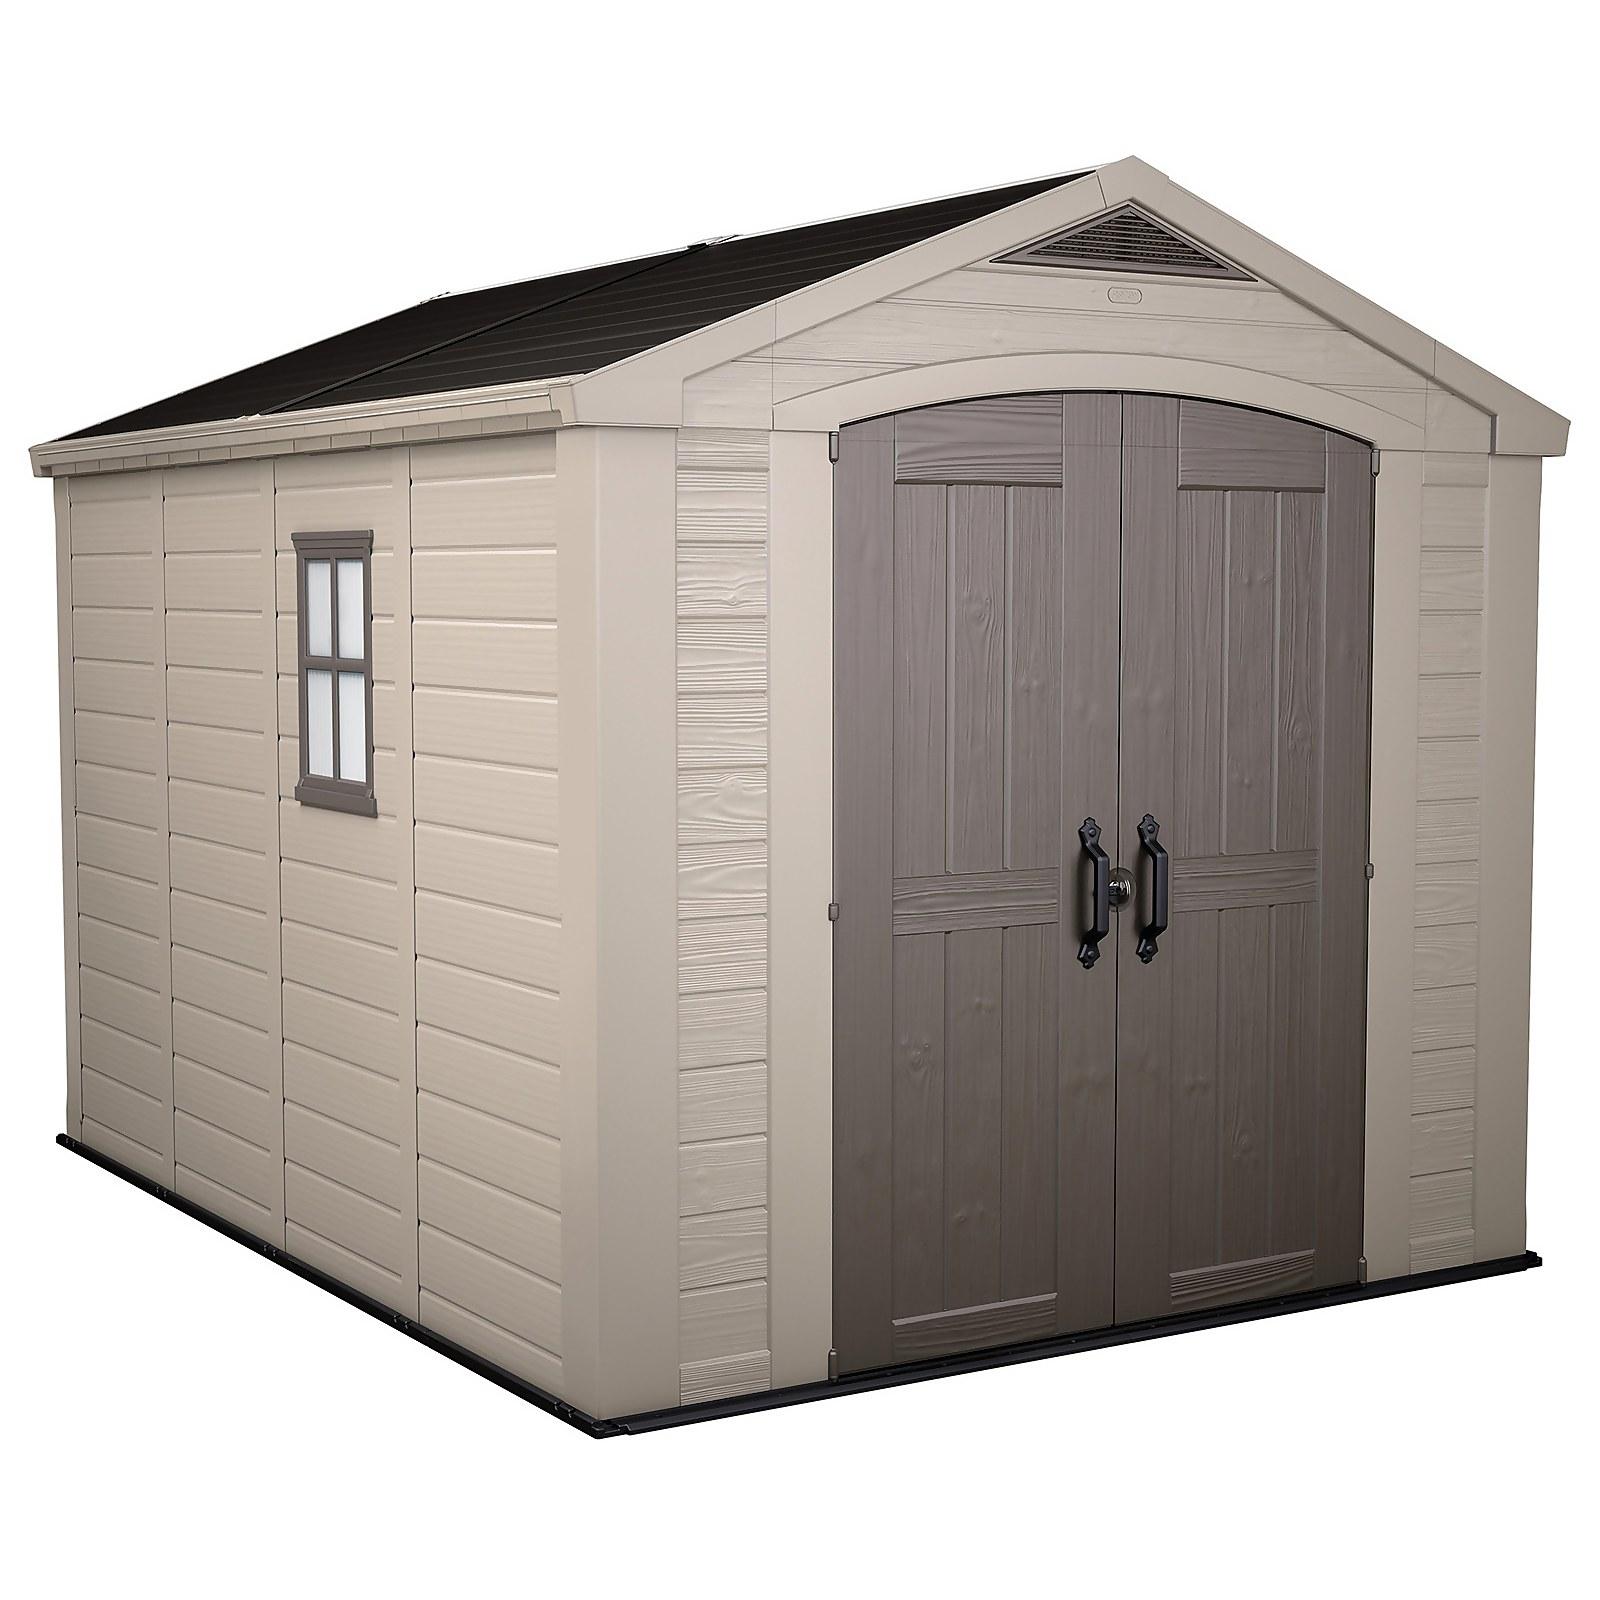 Keter Factor 8 x 11ft Outdoor Garden Apex Storage Shed - Beige/Brown